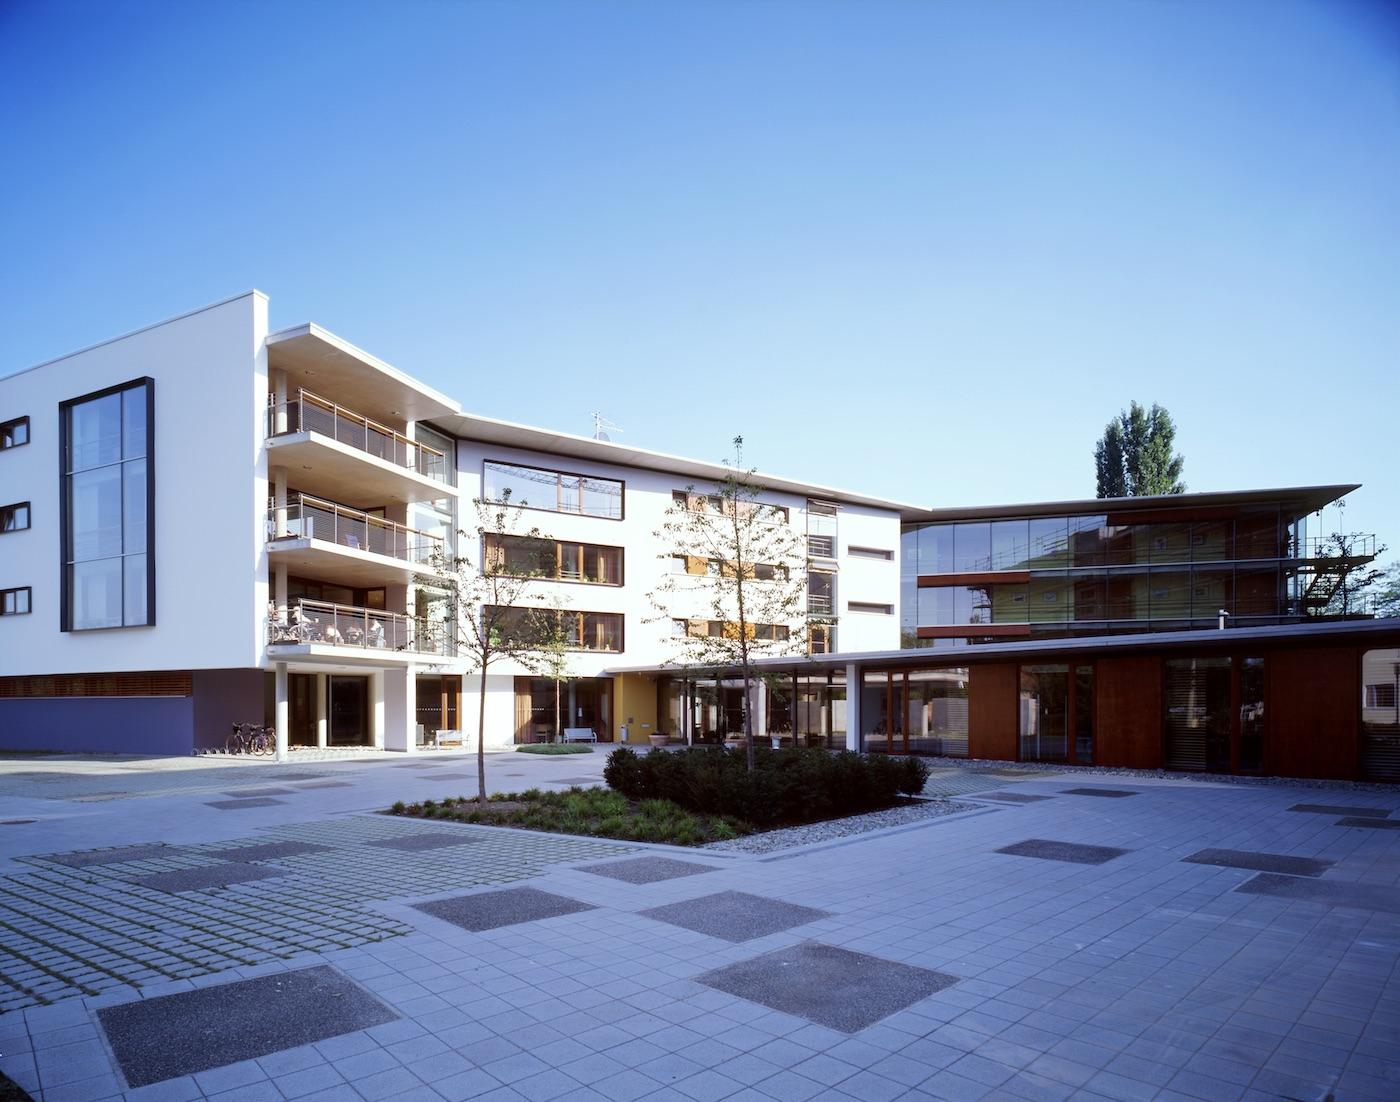 Altenpflegeheim Heideweg